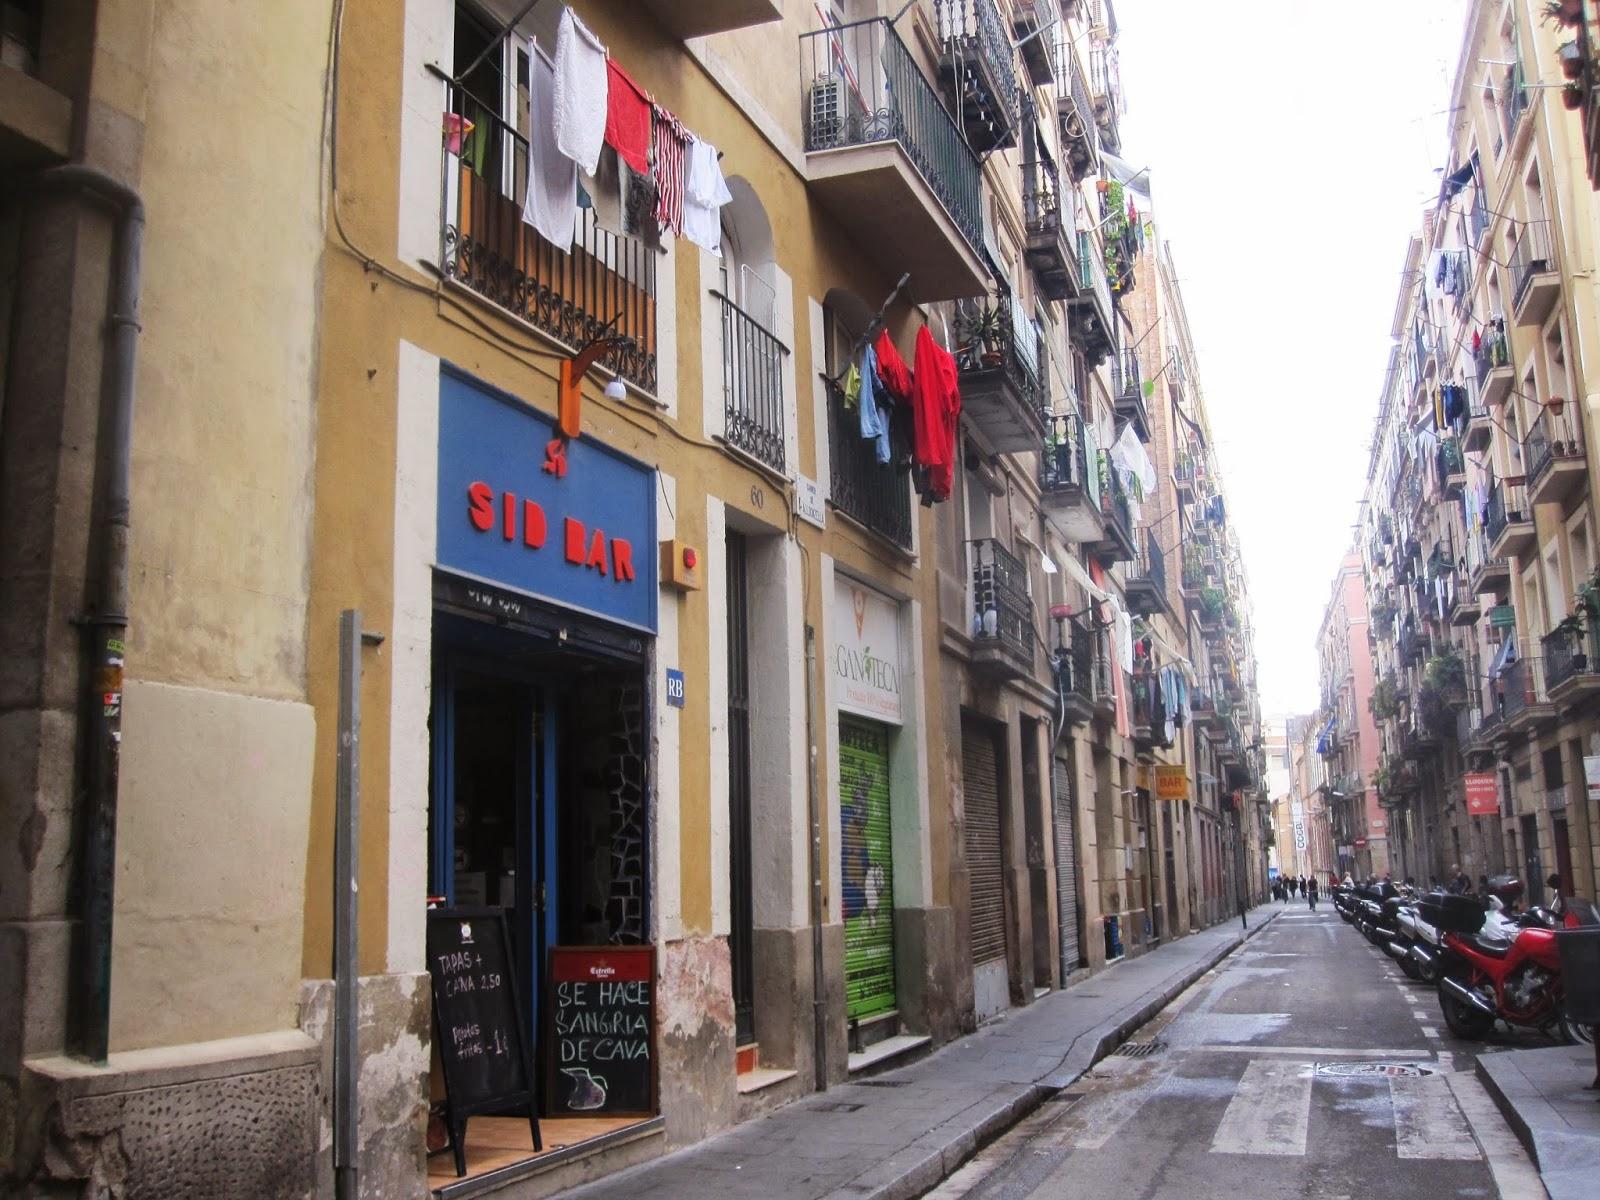 Tot barcelona l mpara jamonera dise o barcelona - Lamparas diseno barcelona ...